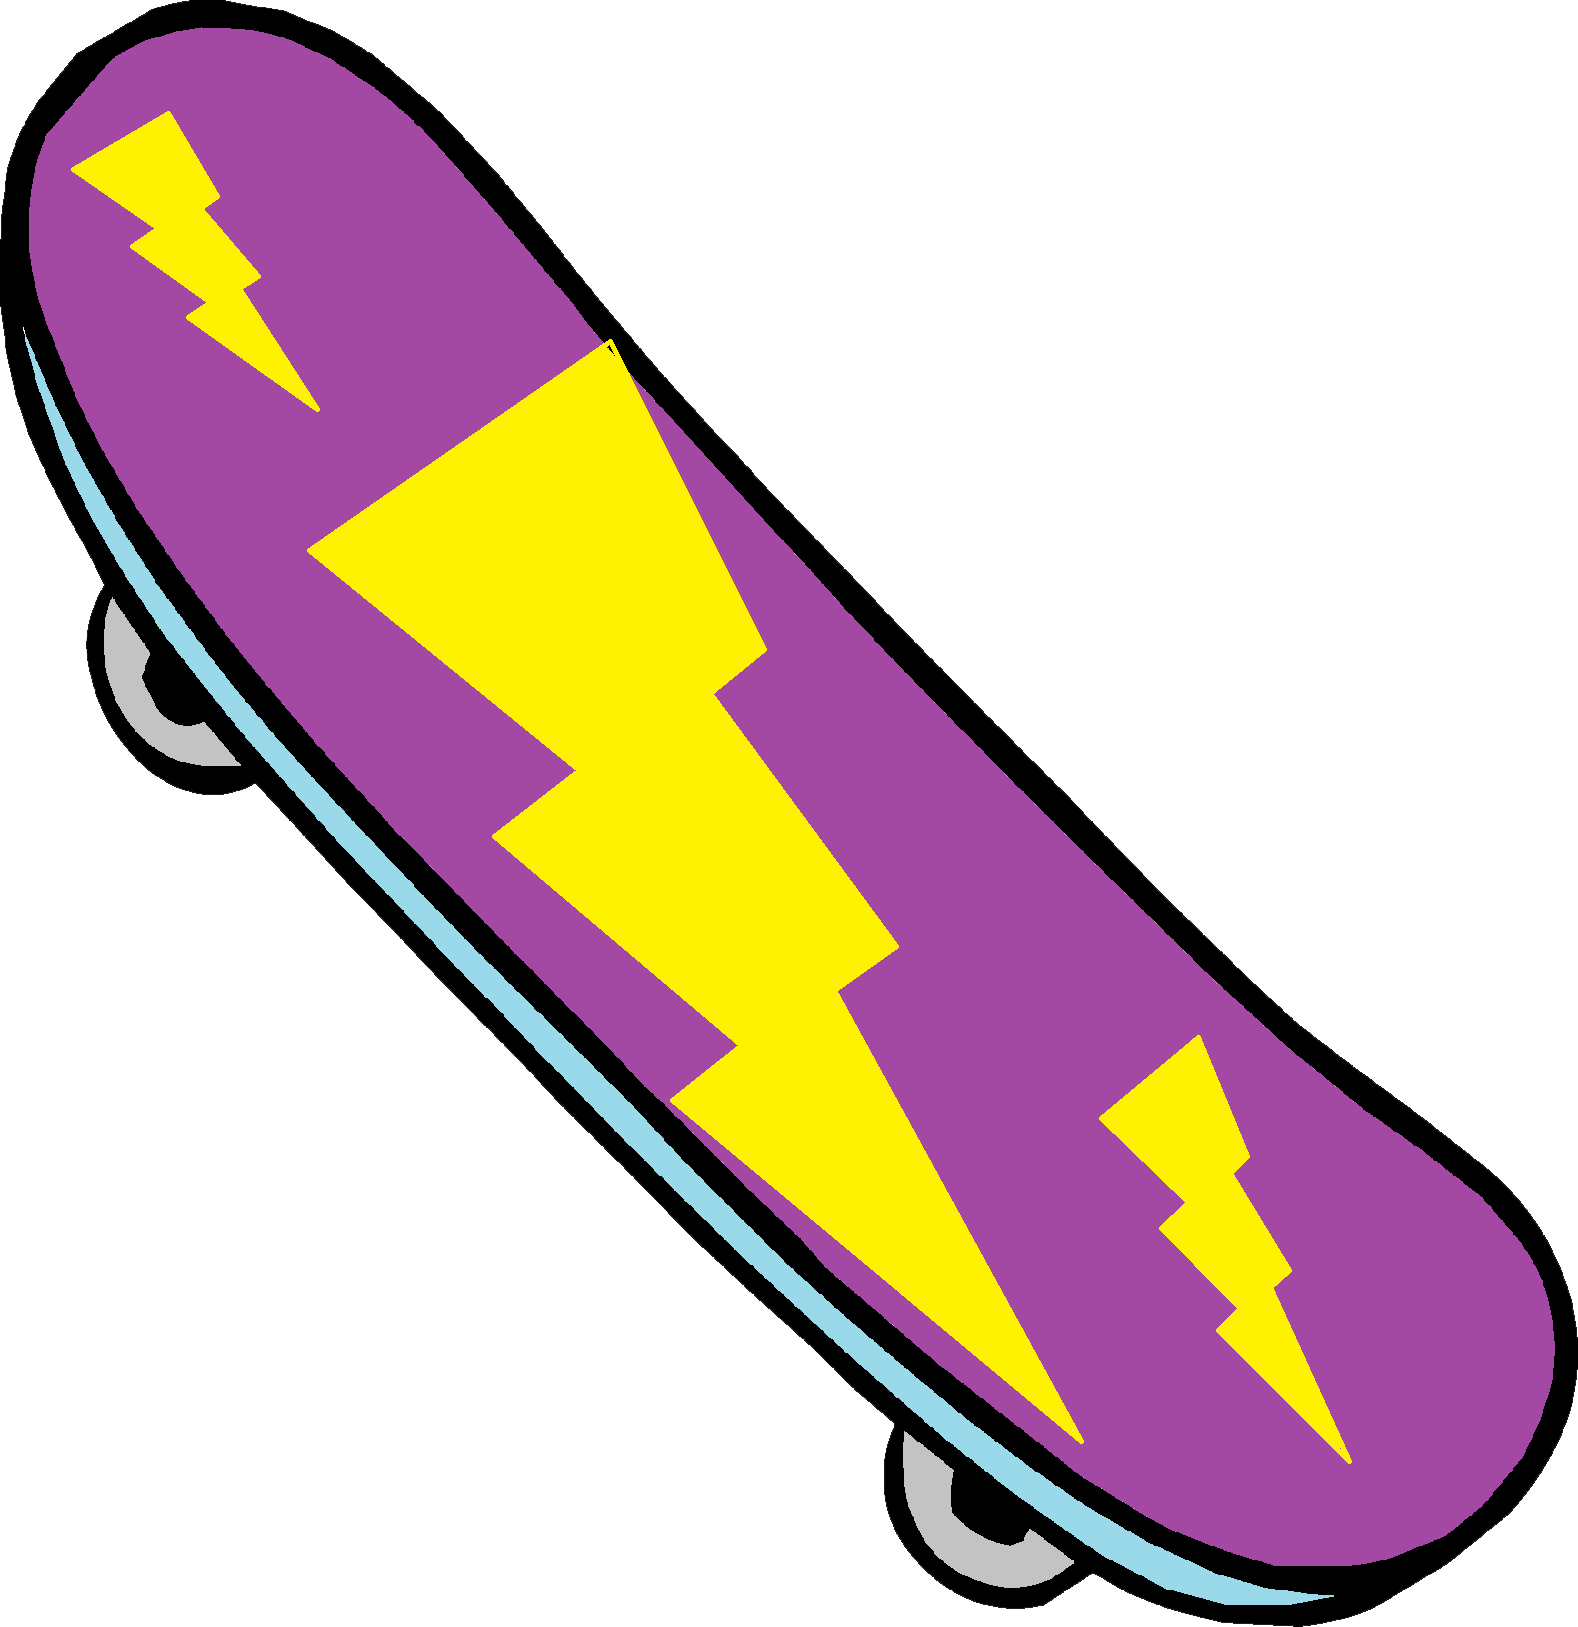 Skateboard clipart adolescent Clip clipart cartoon Skateboard Art